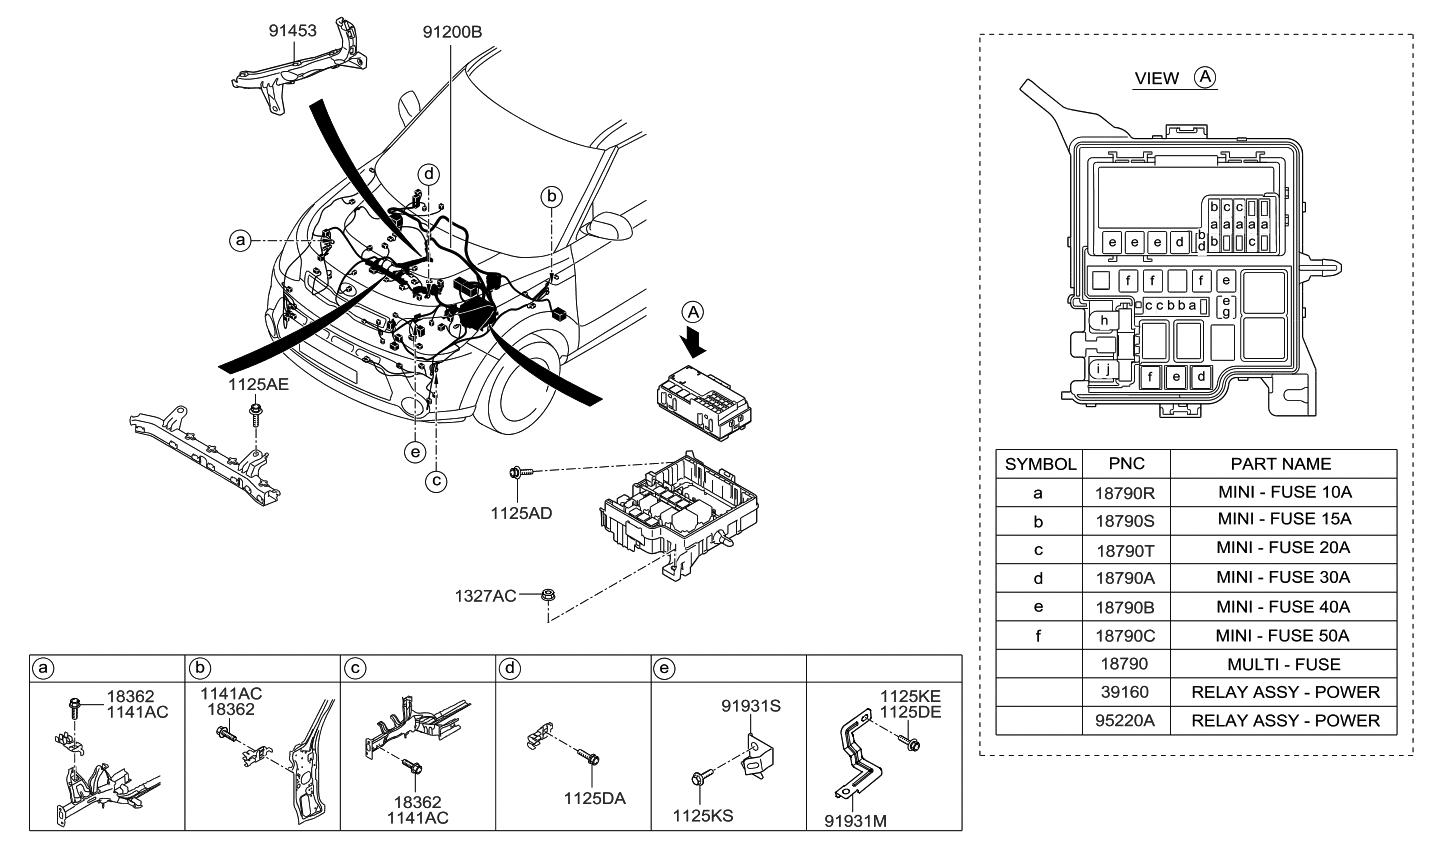 91419b2500 genuine kia wiring assembly control. Black Bedroom Furniture Sets. Home Design Ideas